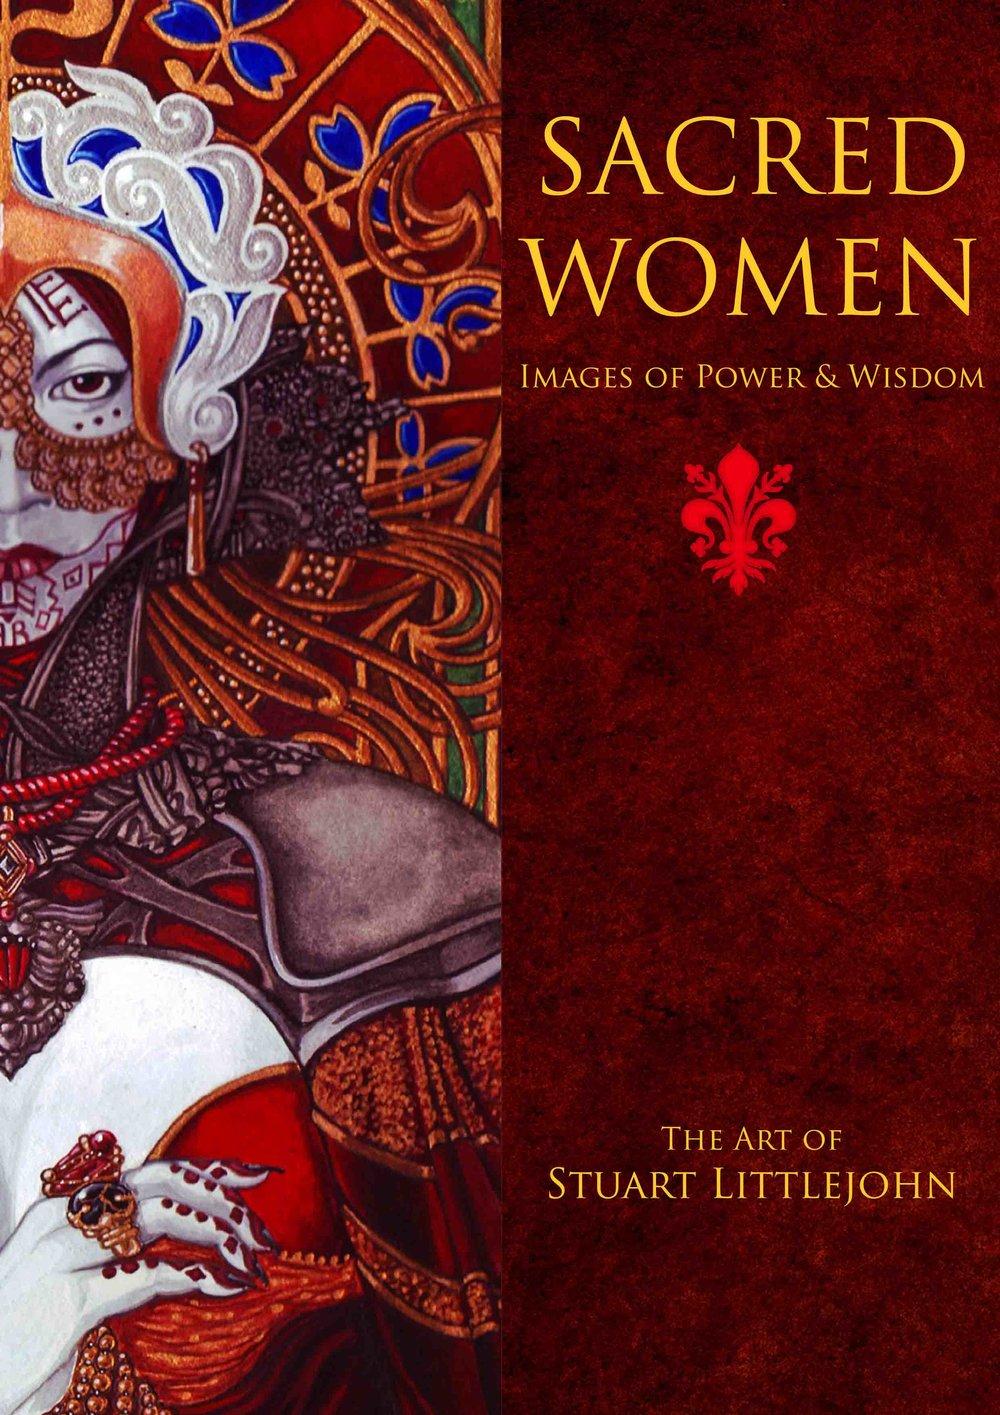 SACRED WOMEN COVER 03A FINALsml.jpg